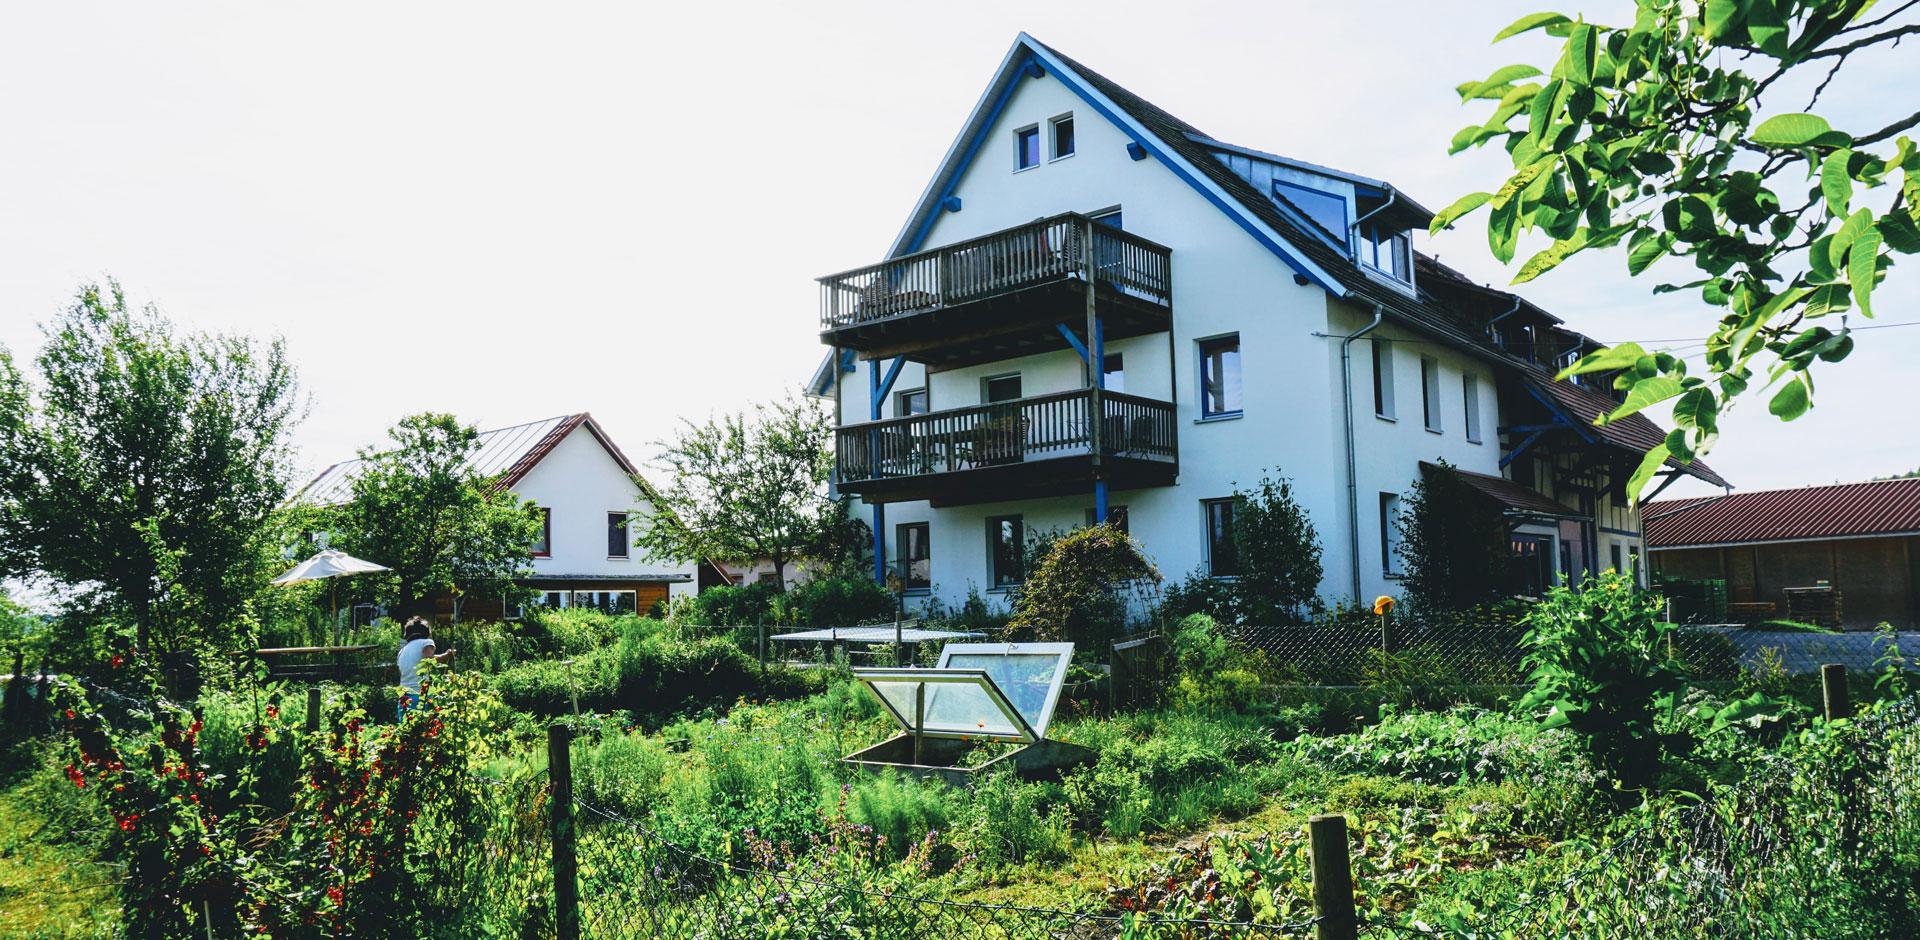 Hof Hoellwangen Bauernhof